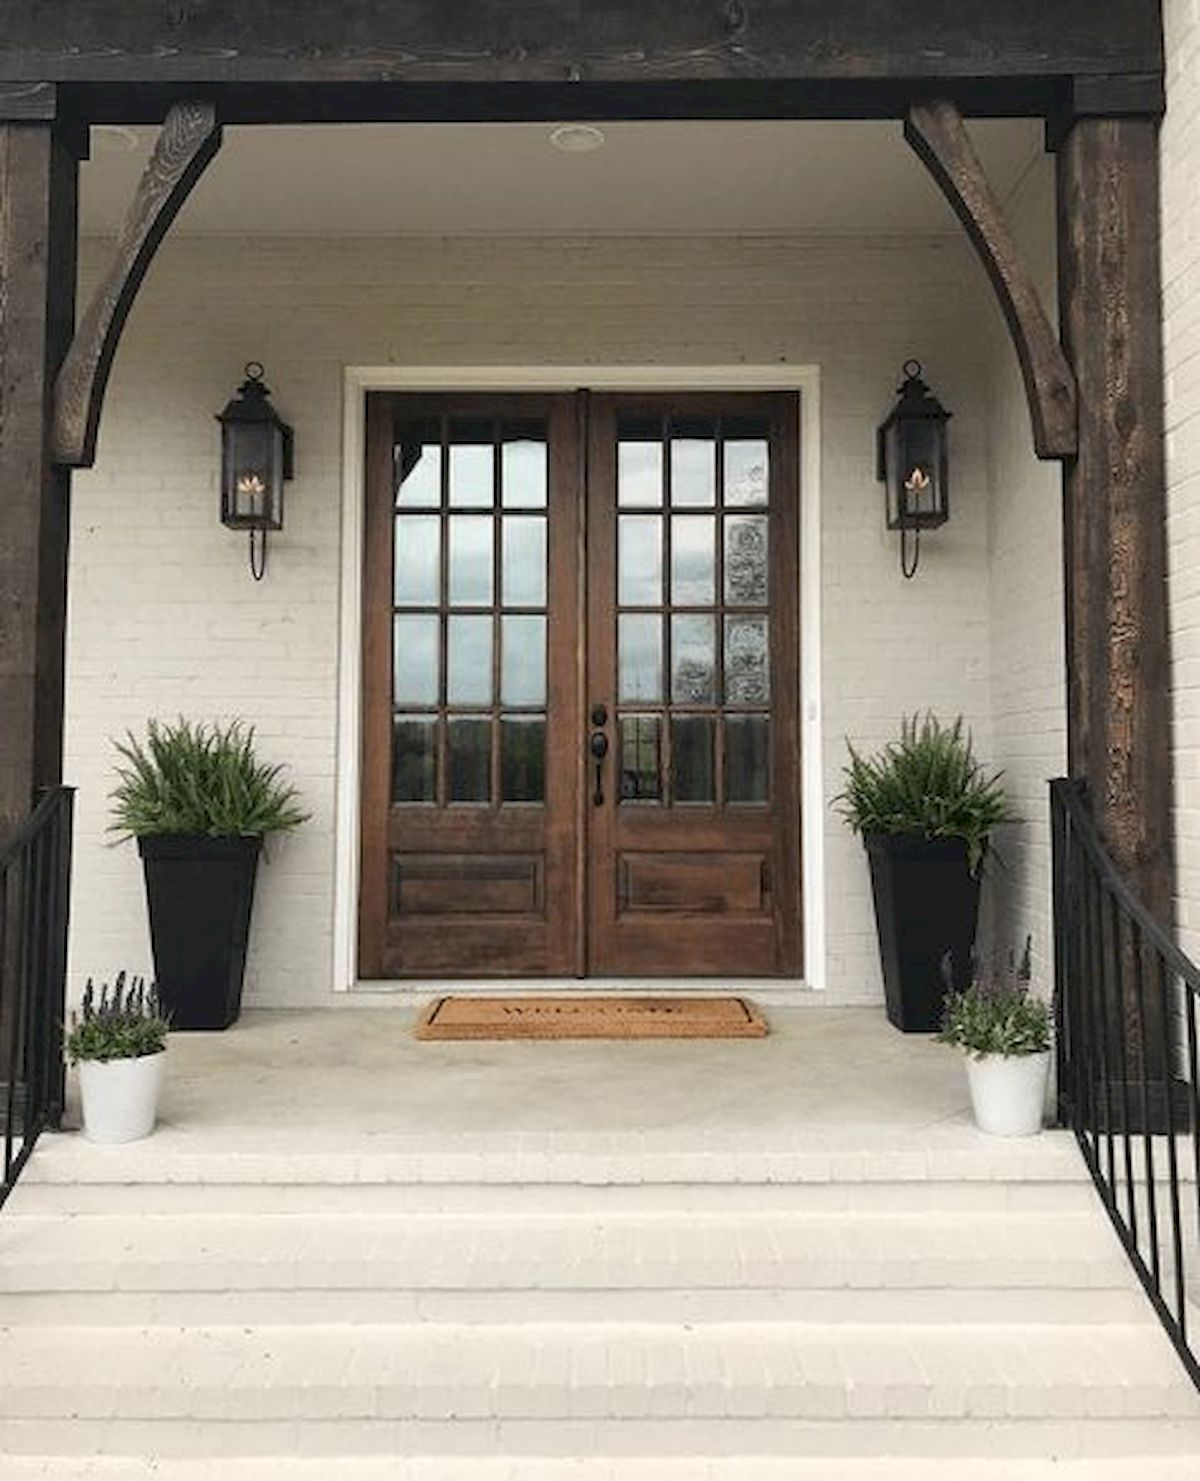 70 beautiful farmhouse front door design ideas and decor on gorgeous modern farmhouse entryway decorating ideas produce a right one id=63058